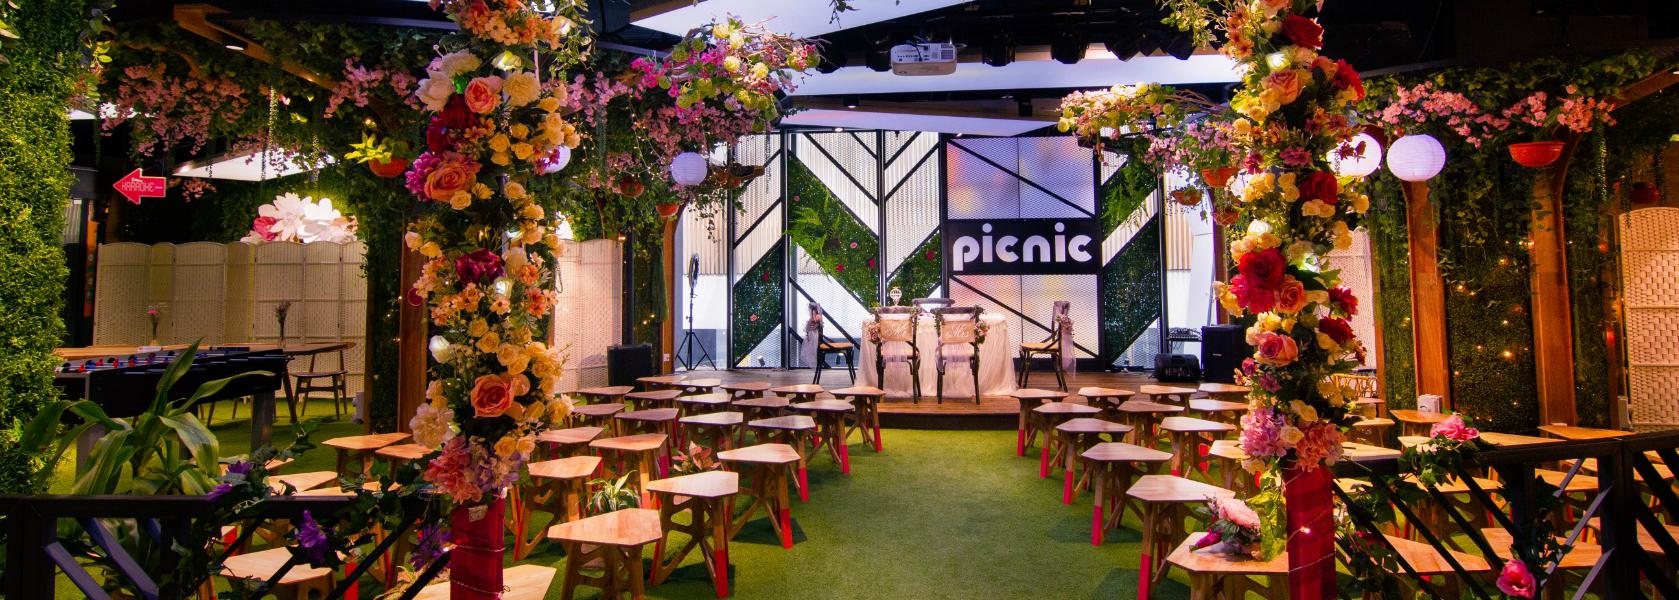 Cihoot venue picnic edited 20